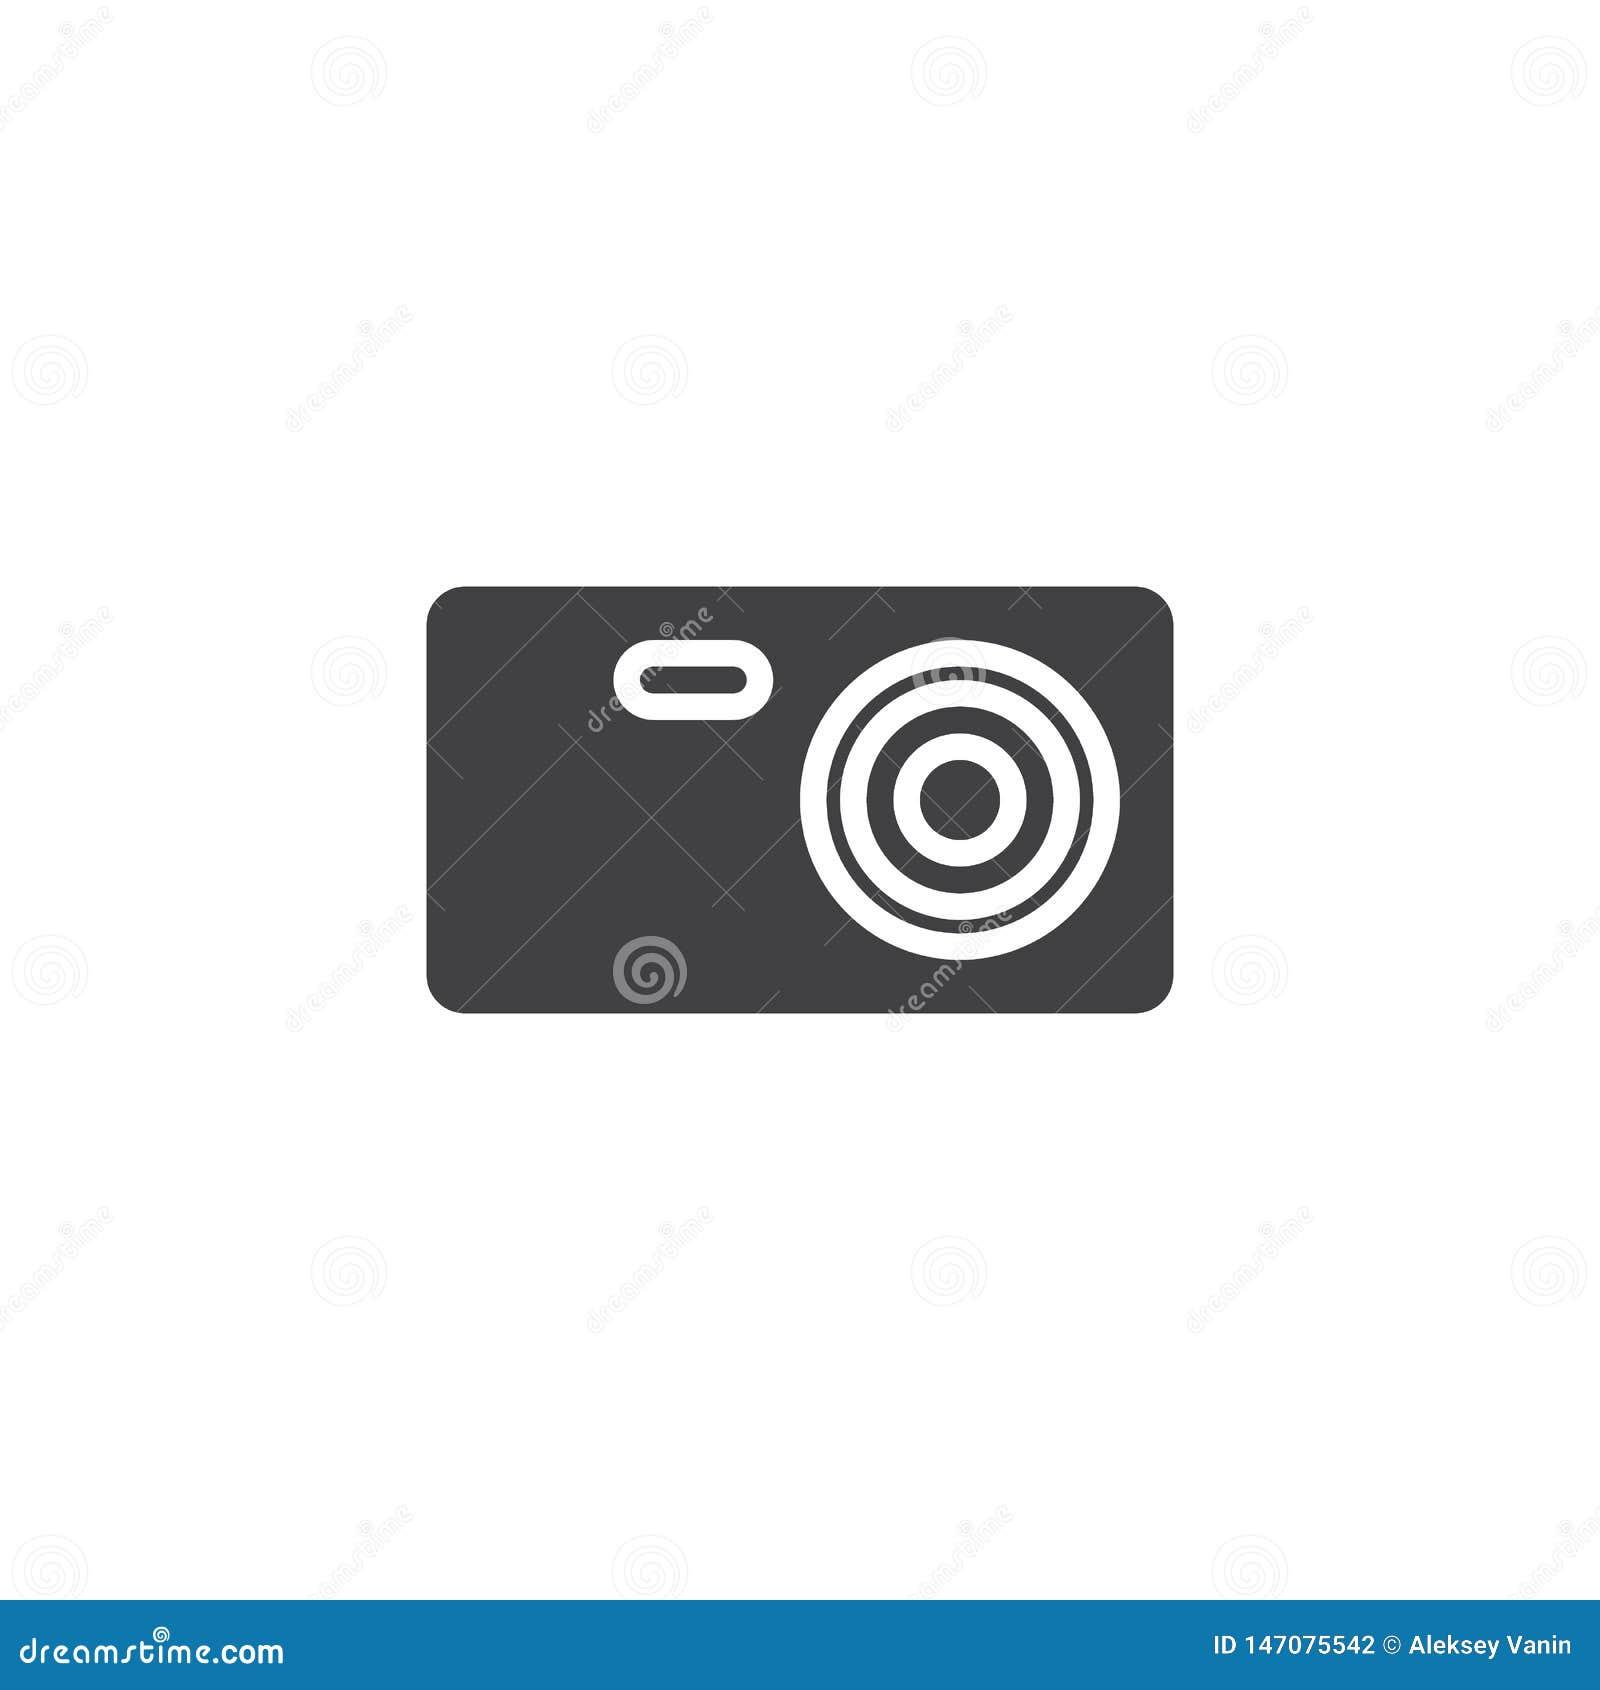 Icône de vecteur de caméra de voyage